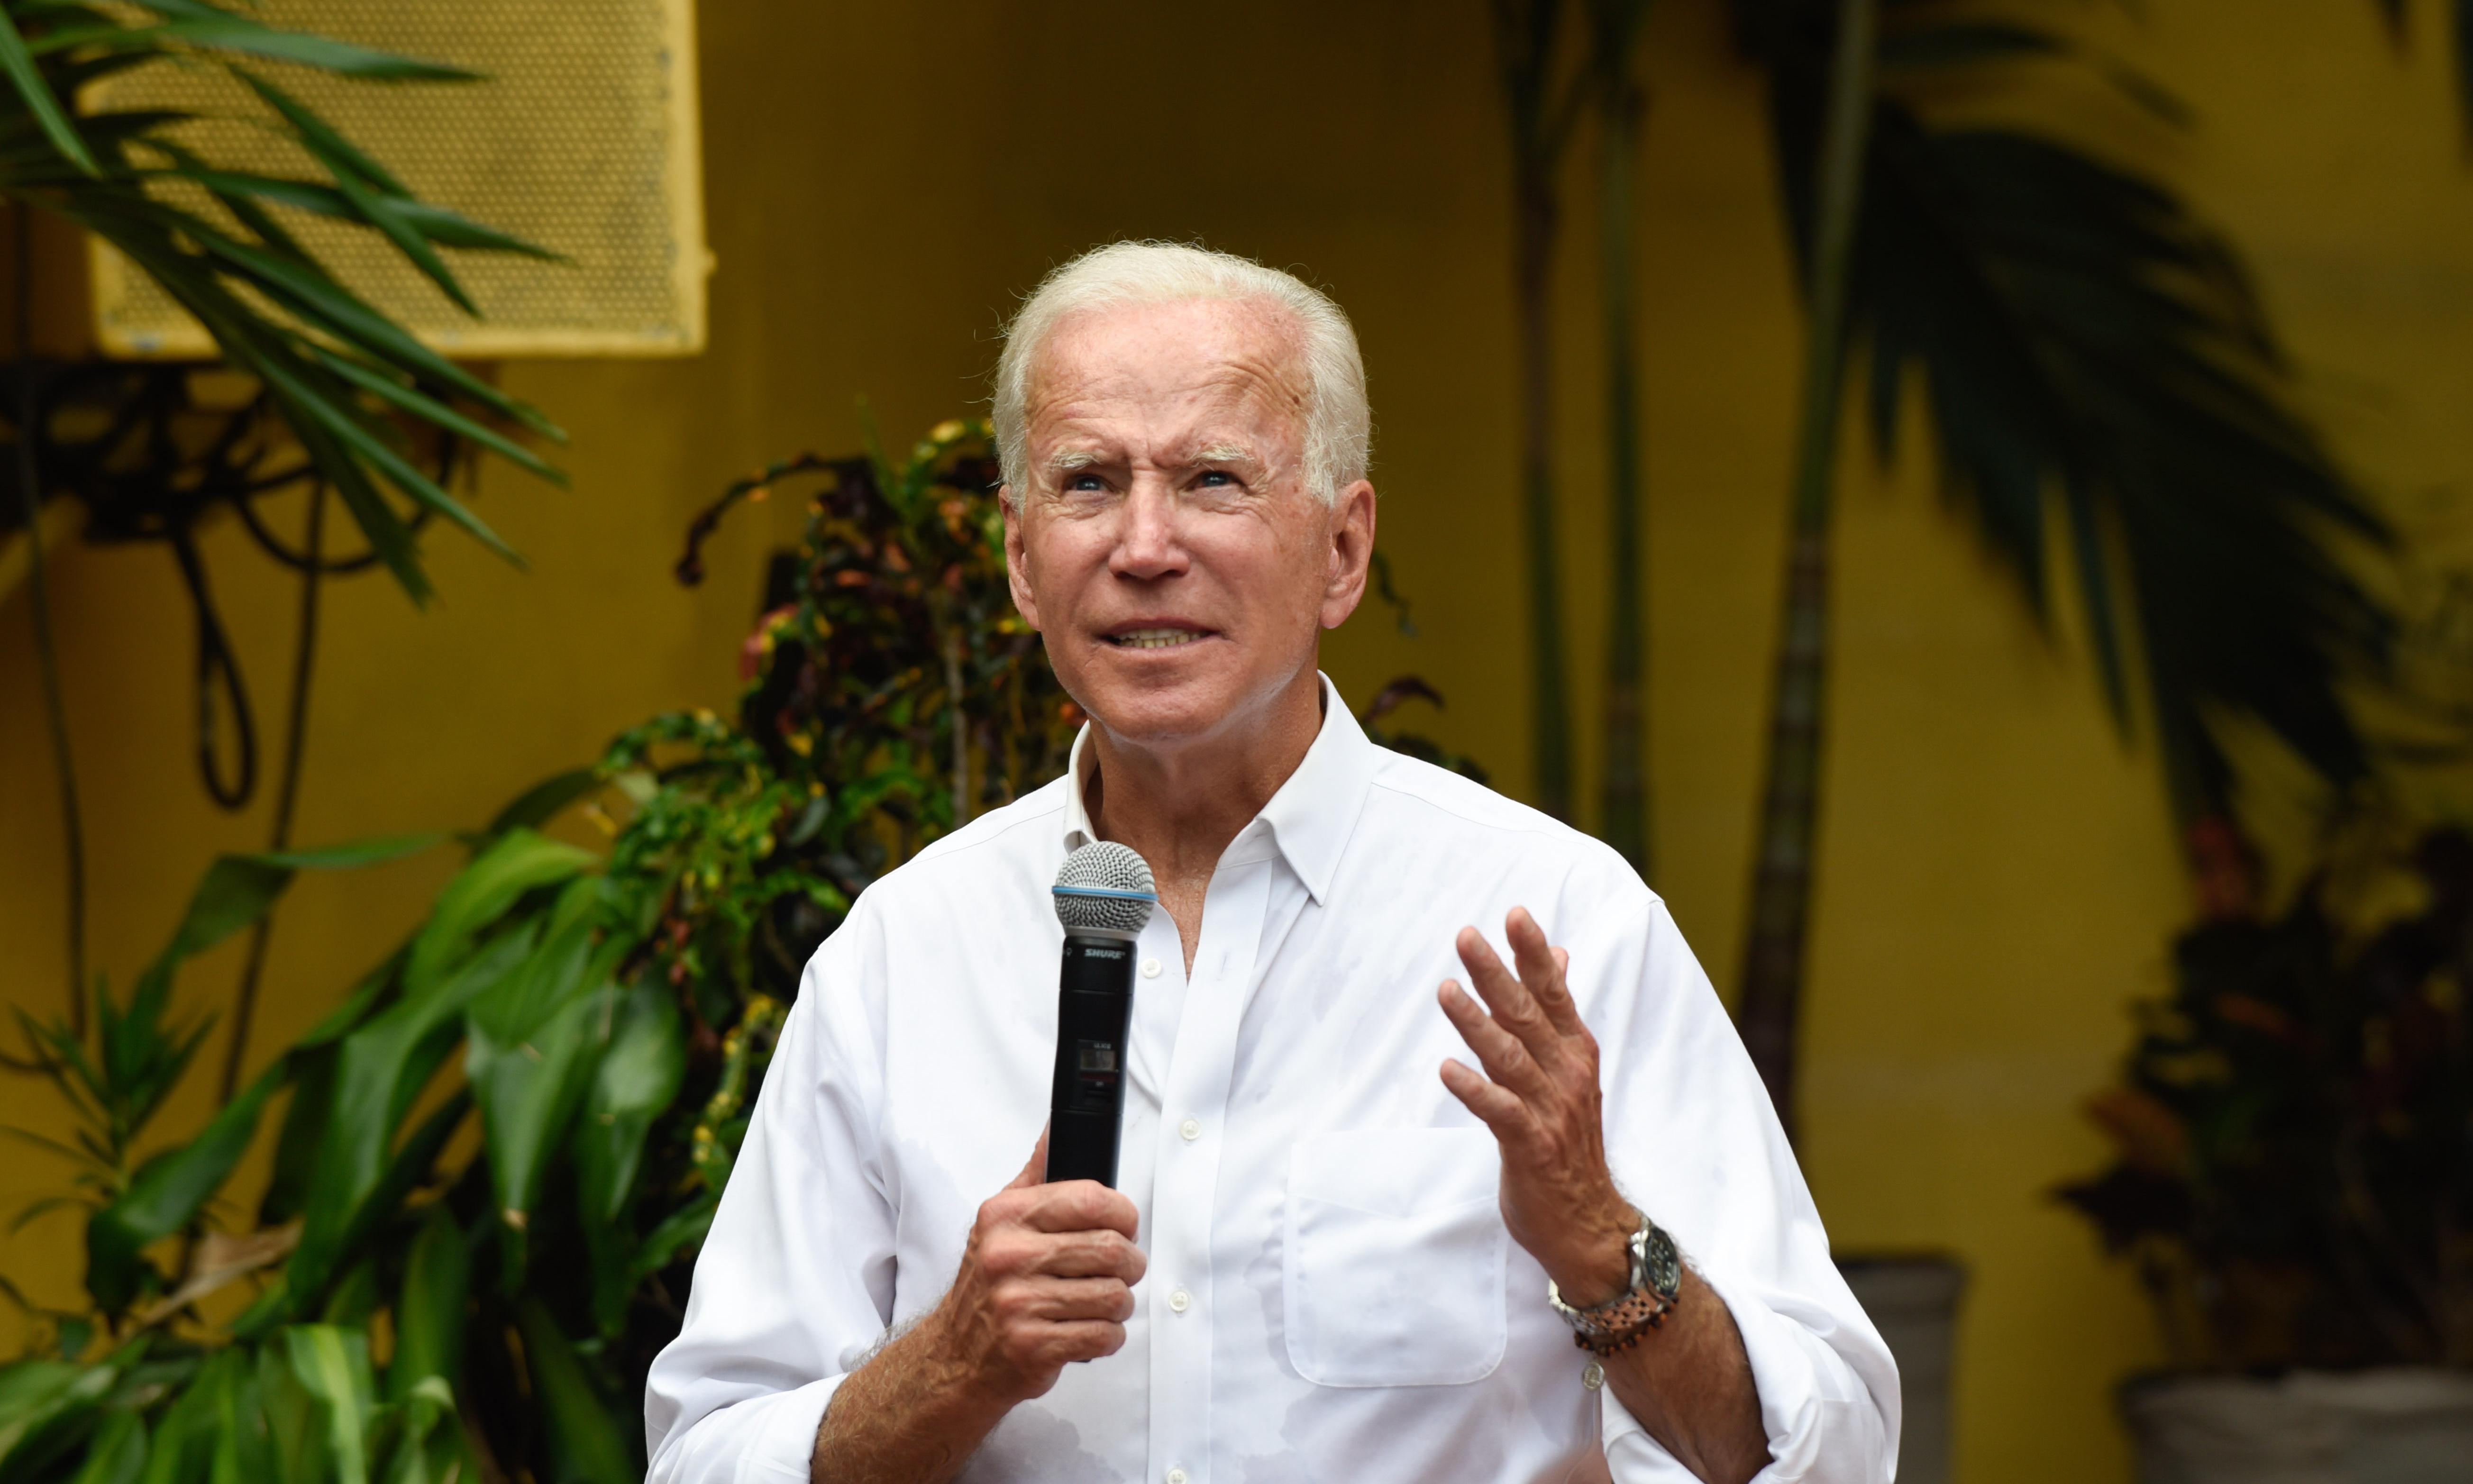 Democrats have long blamed 'culture' for black poverty. Joe Biden is no exception